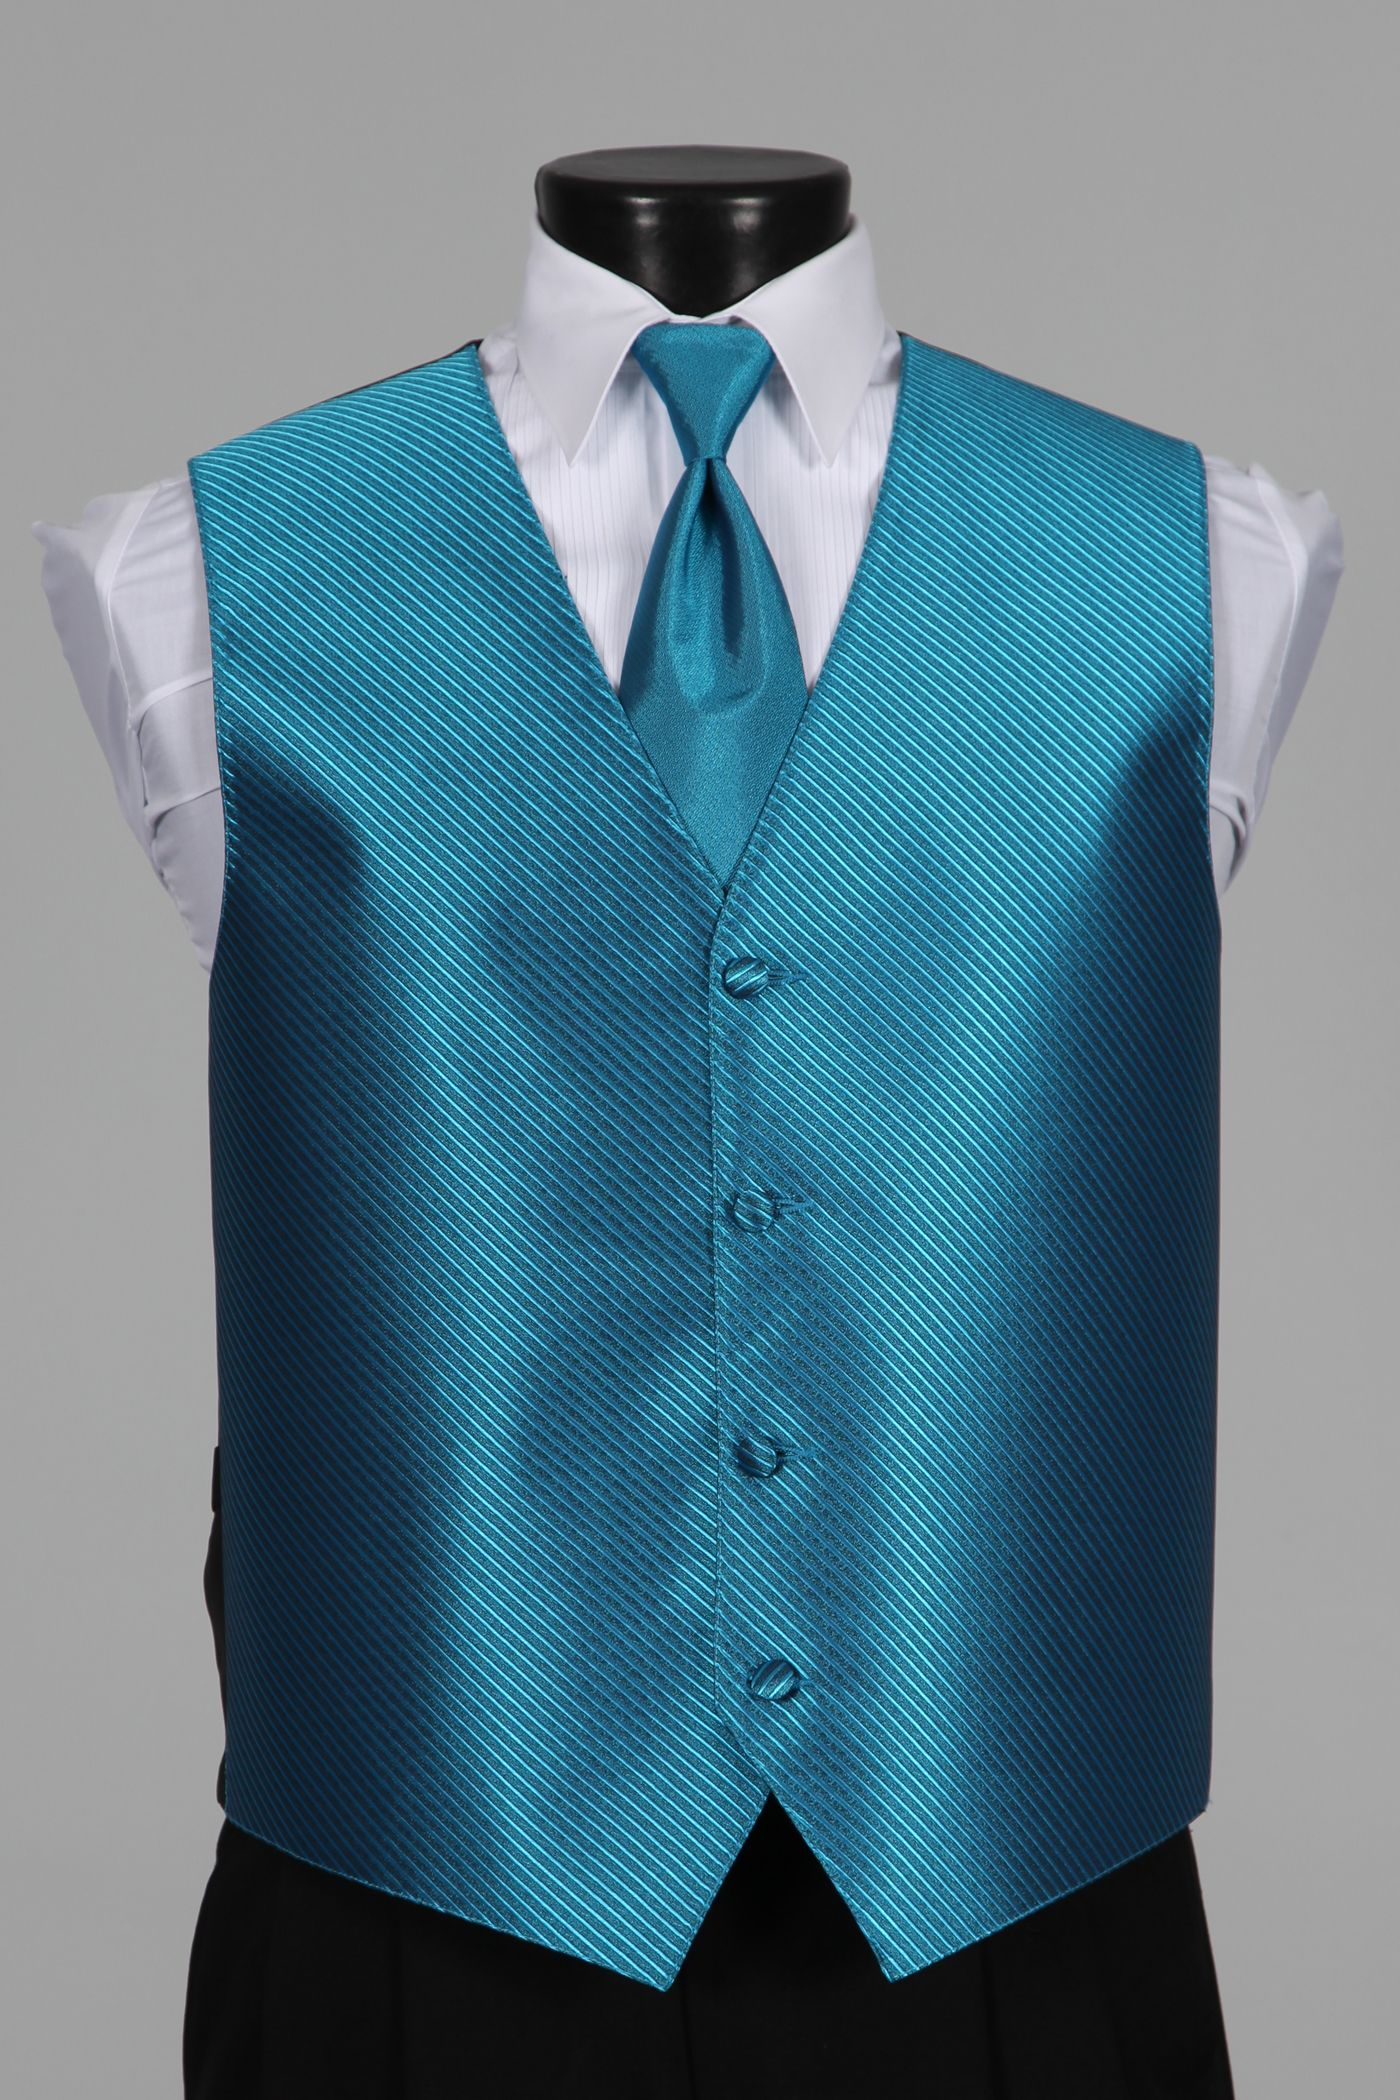 Dunhill Tuxedos Larr Brio Coronado Aquamarine 3001 | Blues, Aquas ...